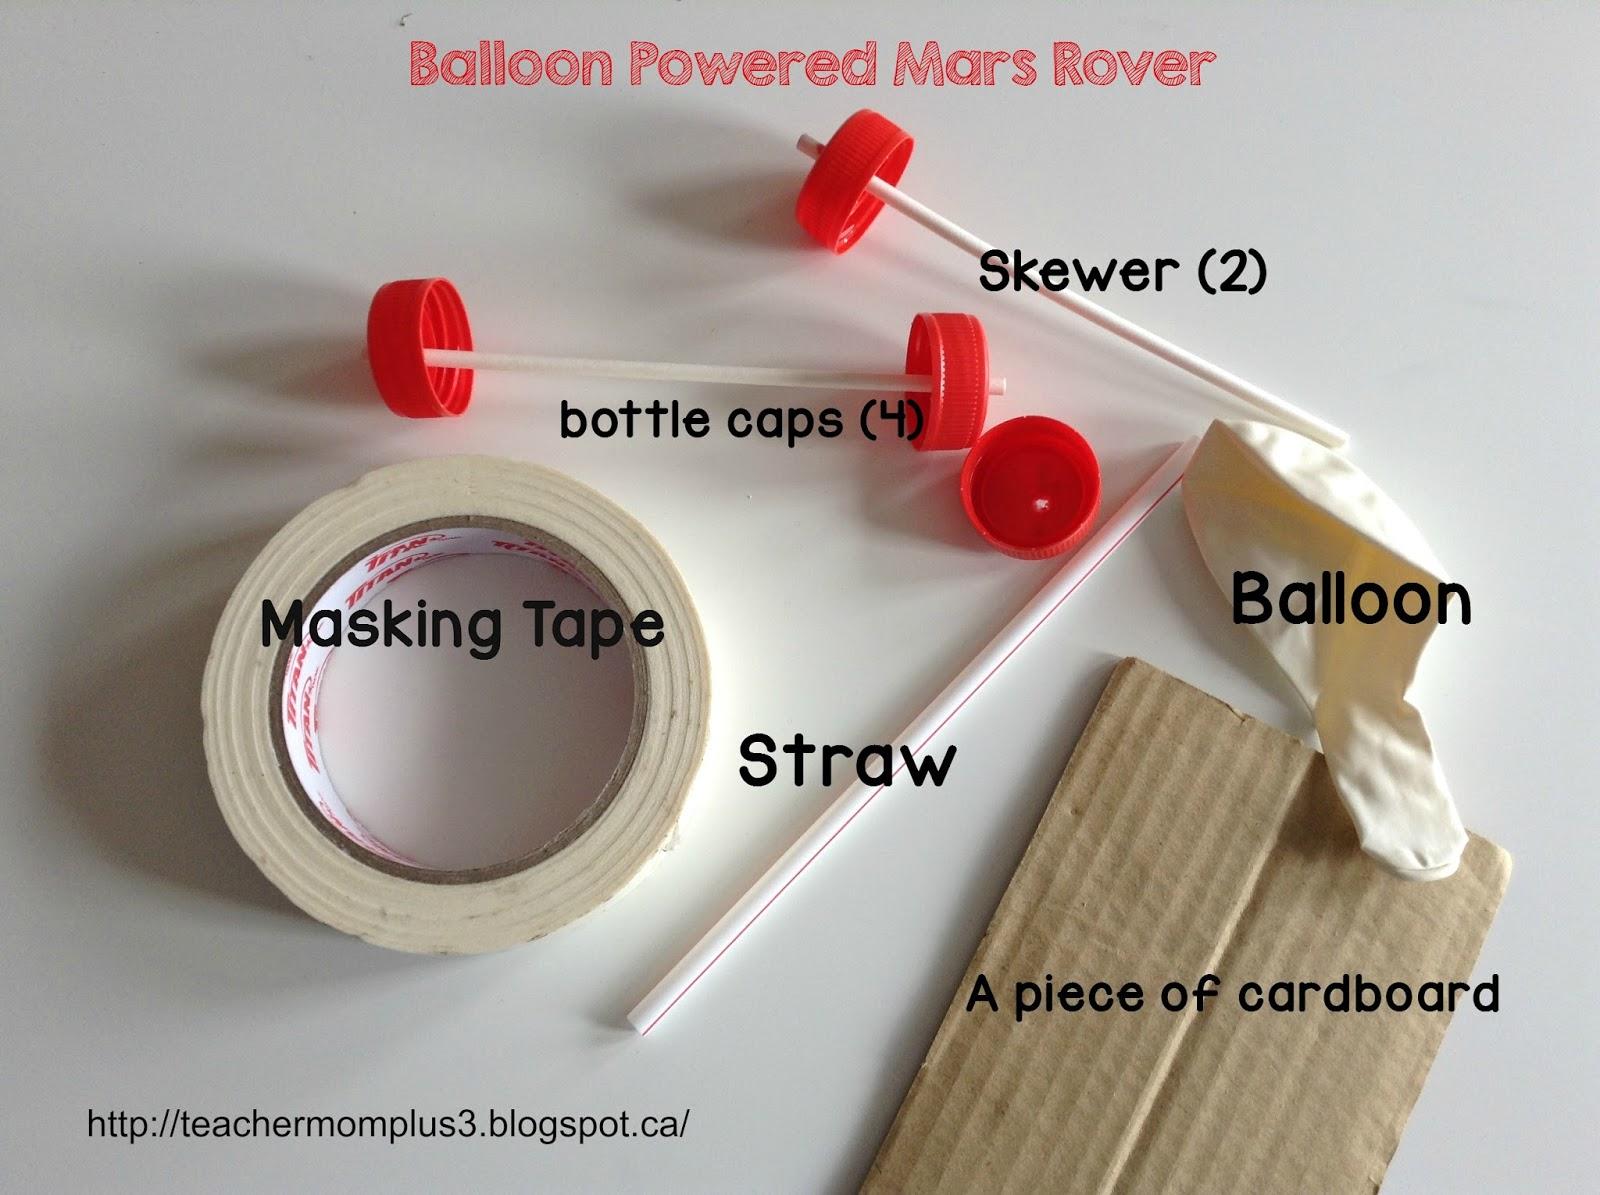 mars rover balloons - photo #22